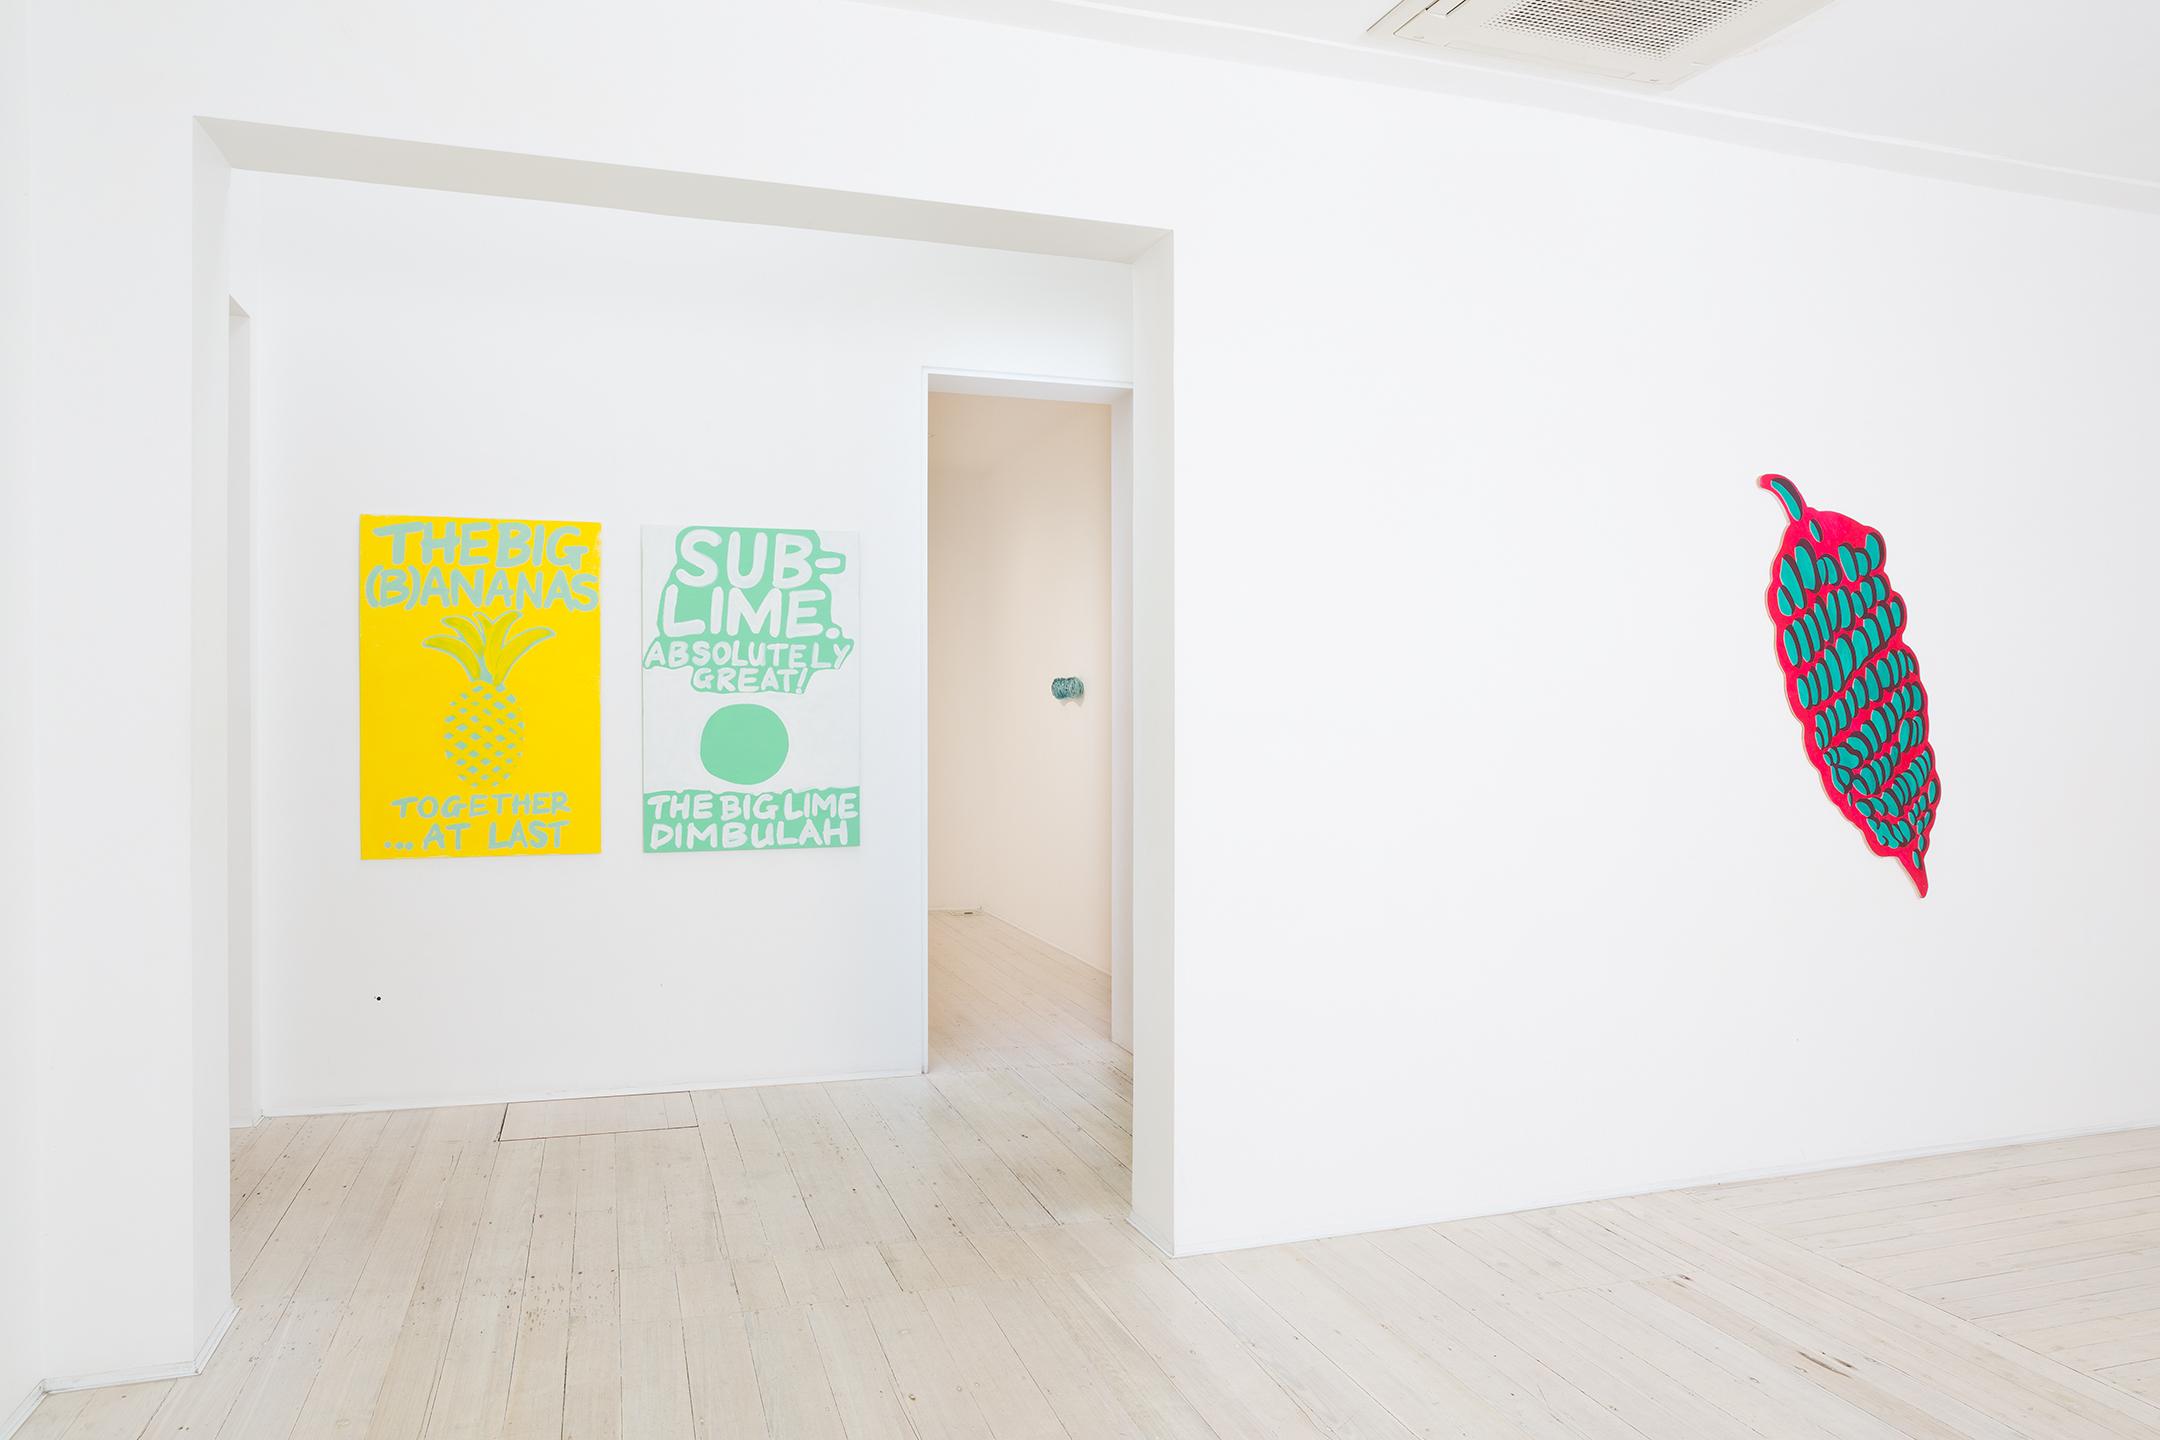 SEAN RAFFERTY    (B)ANANAS  2015 (left) Acrylic on plywood 120 × 80 cm   Sub-lime  2015 (middle) Acrylic on plywood 120 × 80 cm   Bananas  2014 (right) Oil and acrylic on plywood 144 × 54 cm